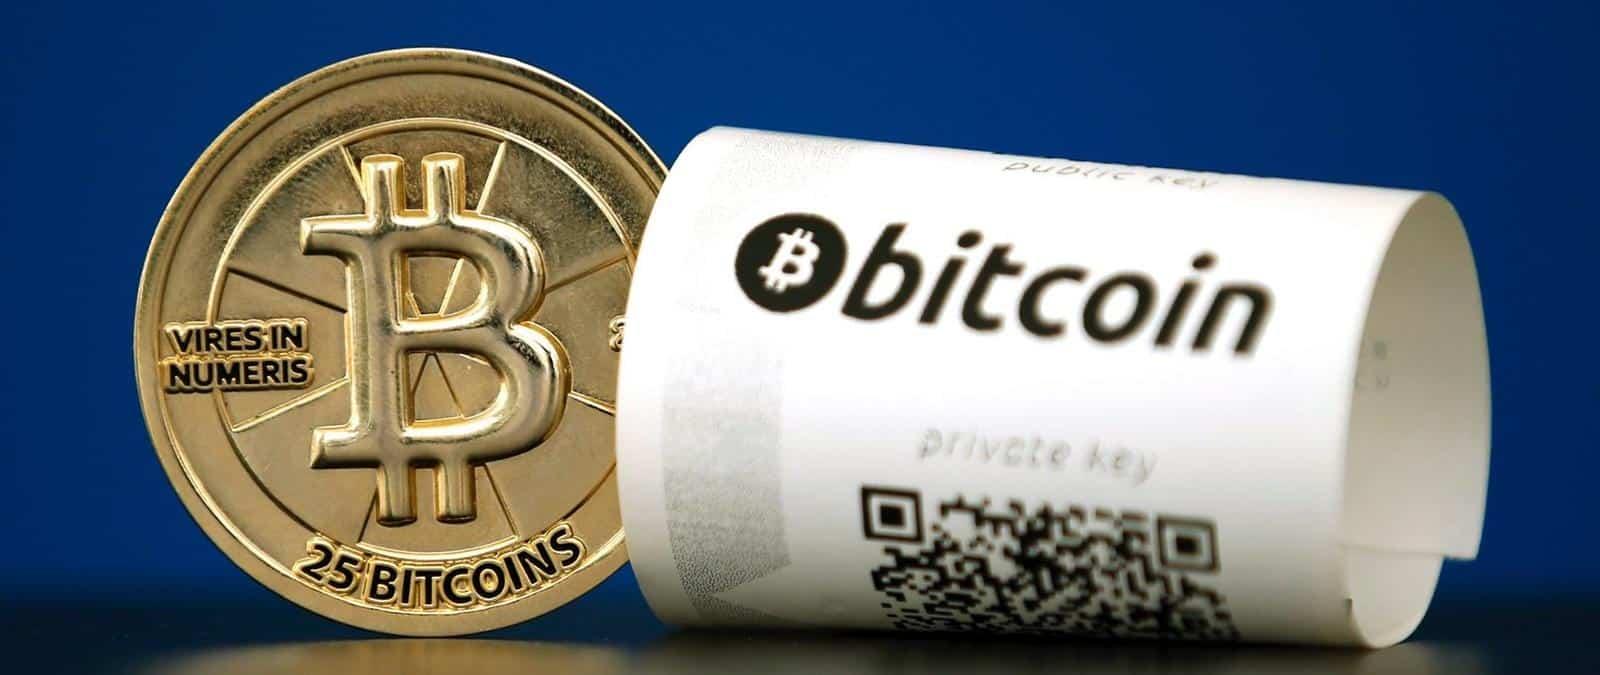 Синхронизация Биткоинов (Bitcoins Synchronization)